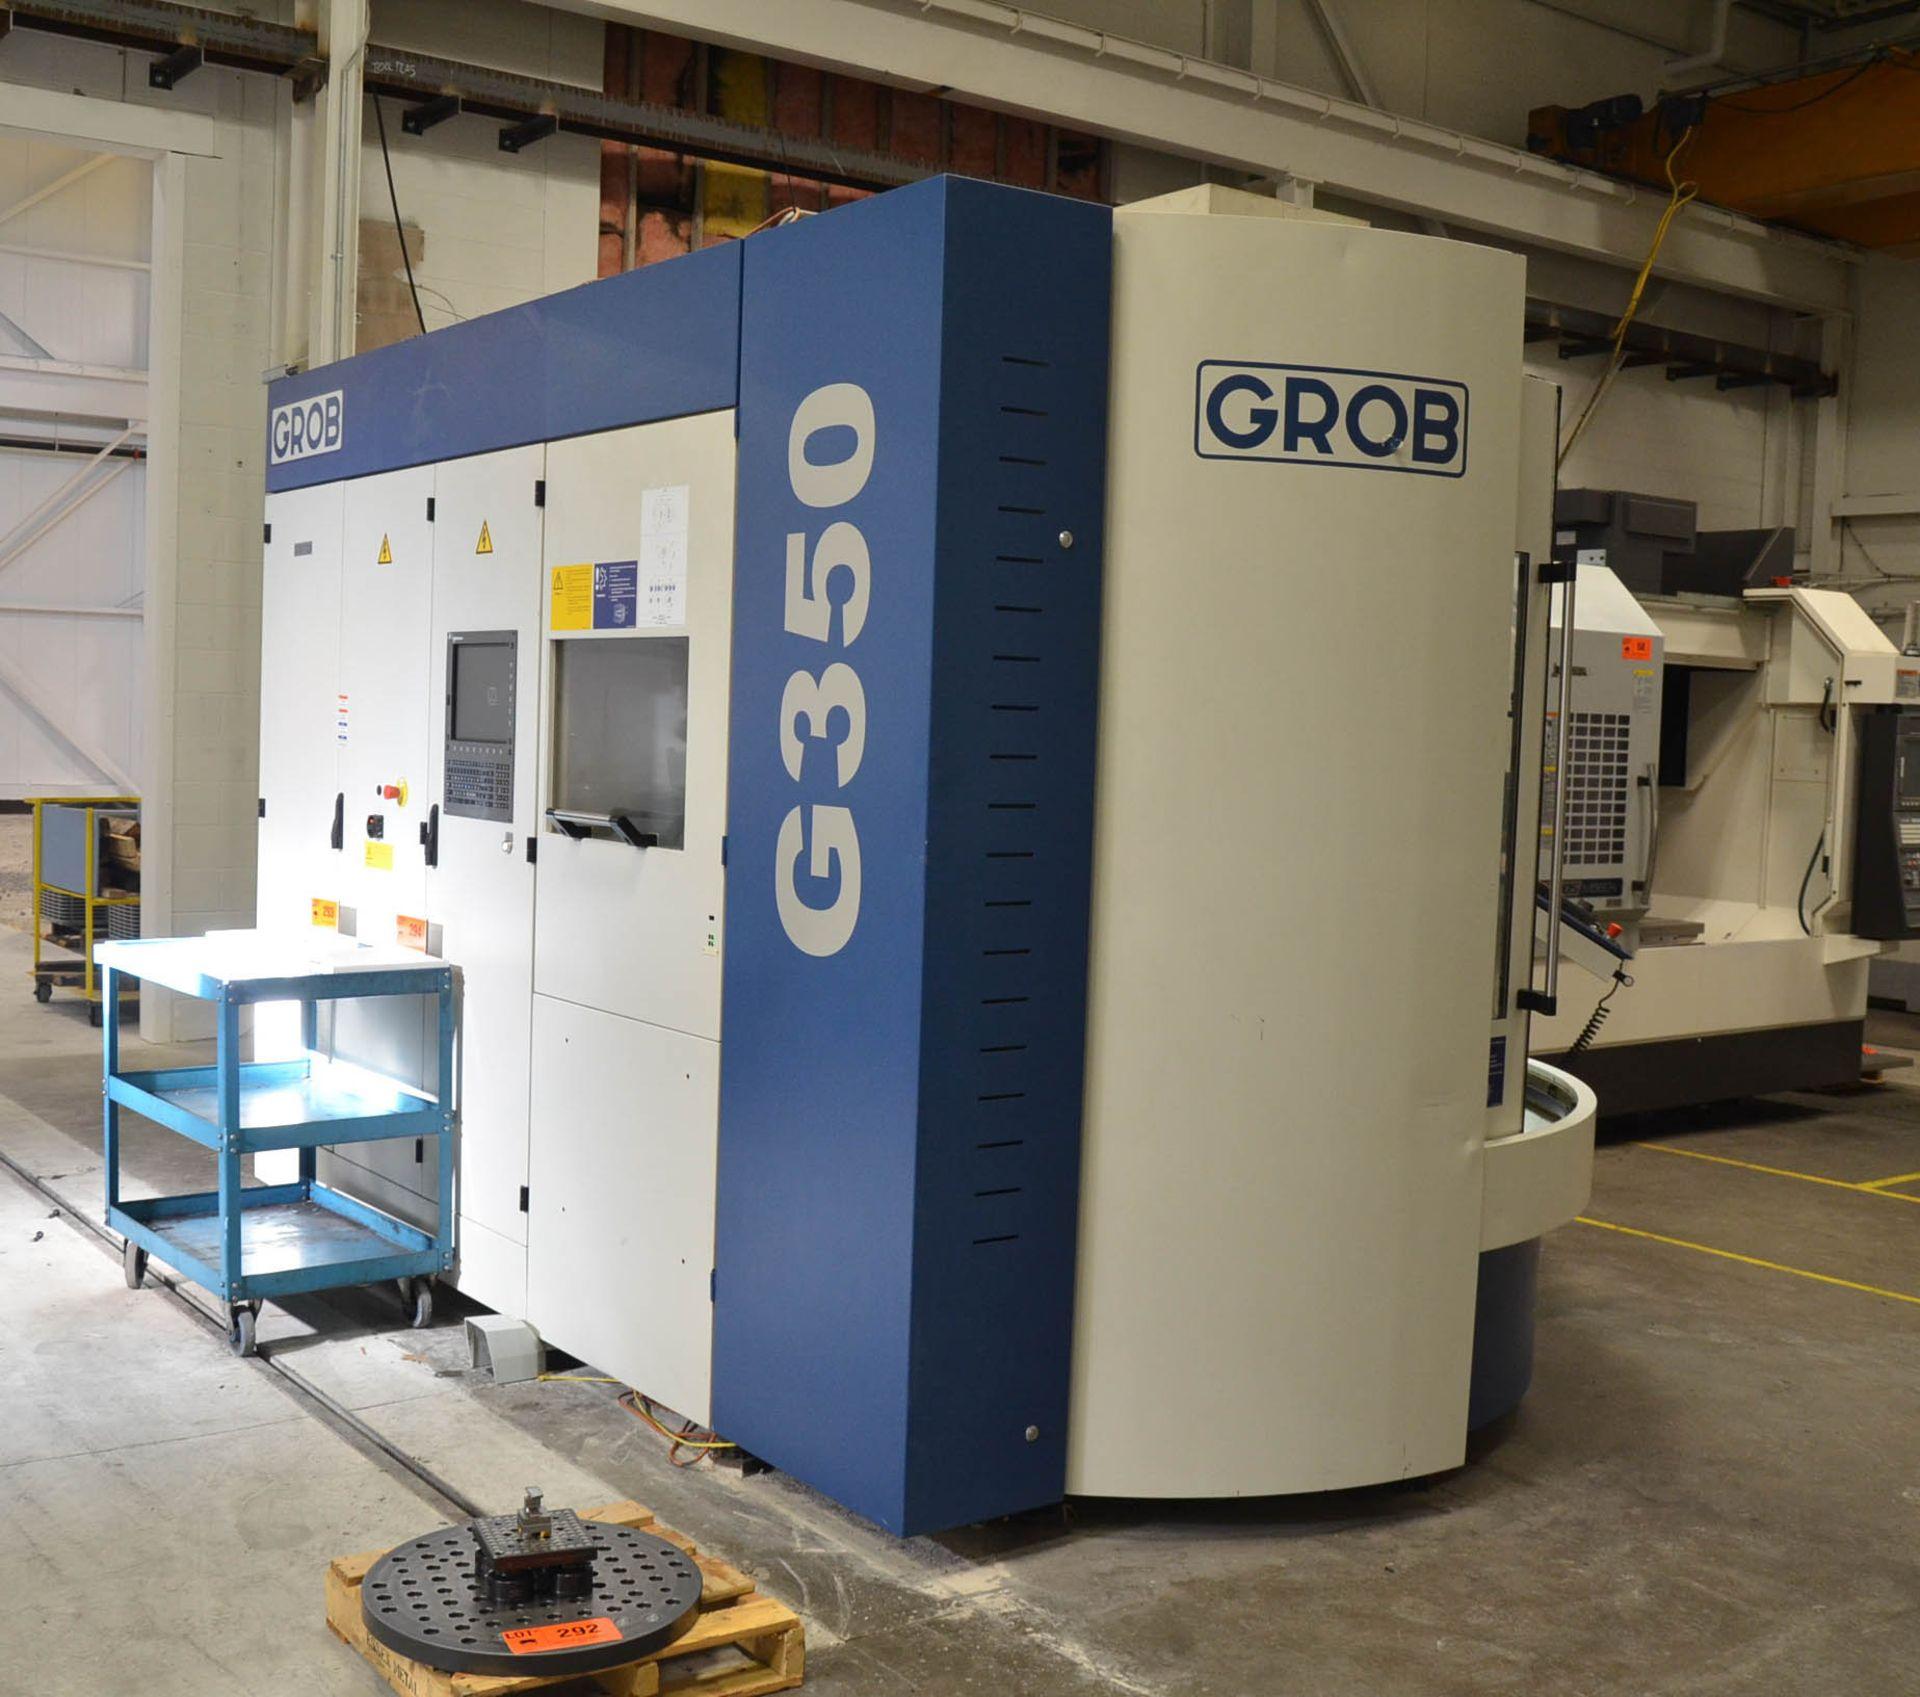 "GROB (2012) G350 5-AXIS CNC MACHINING CENTER WITH HEIDENHAIN ITNC 530 CNC CONTROL, 22.25"" DIAMETER - Image 5 of 12"